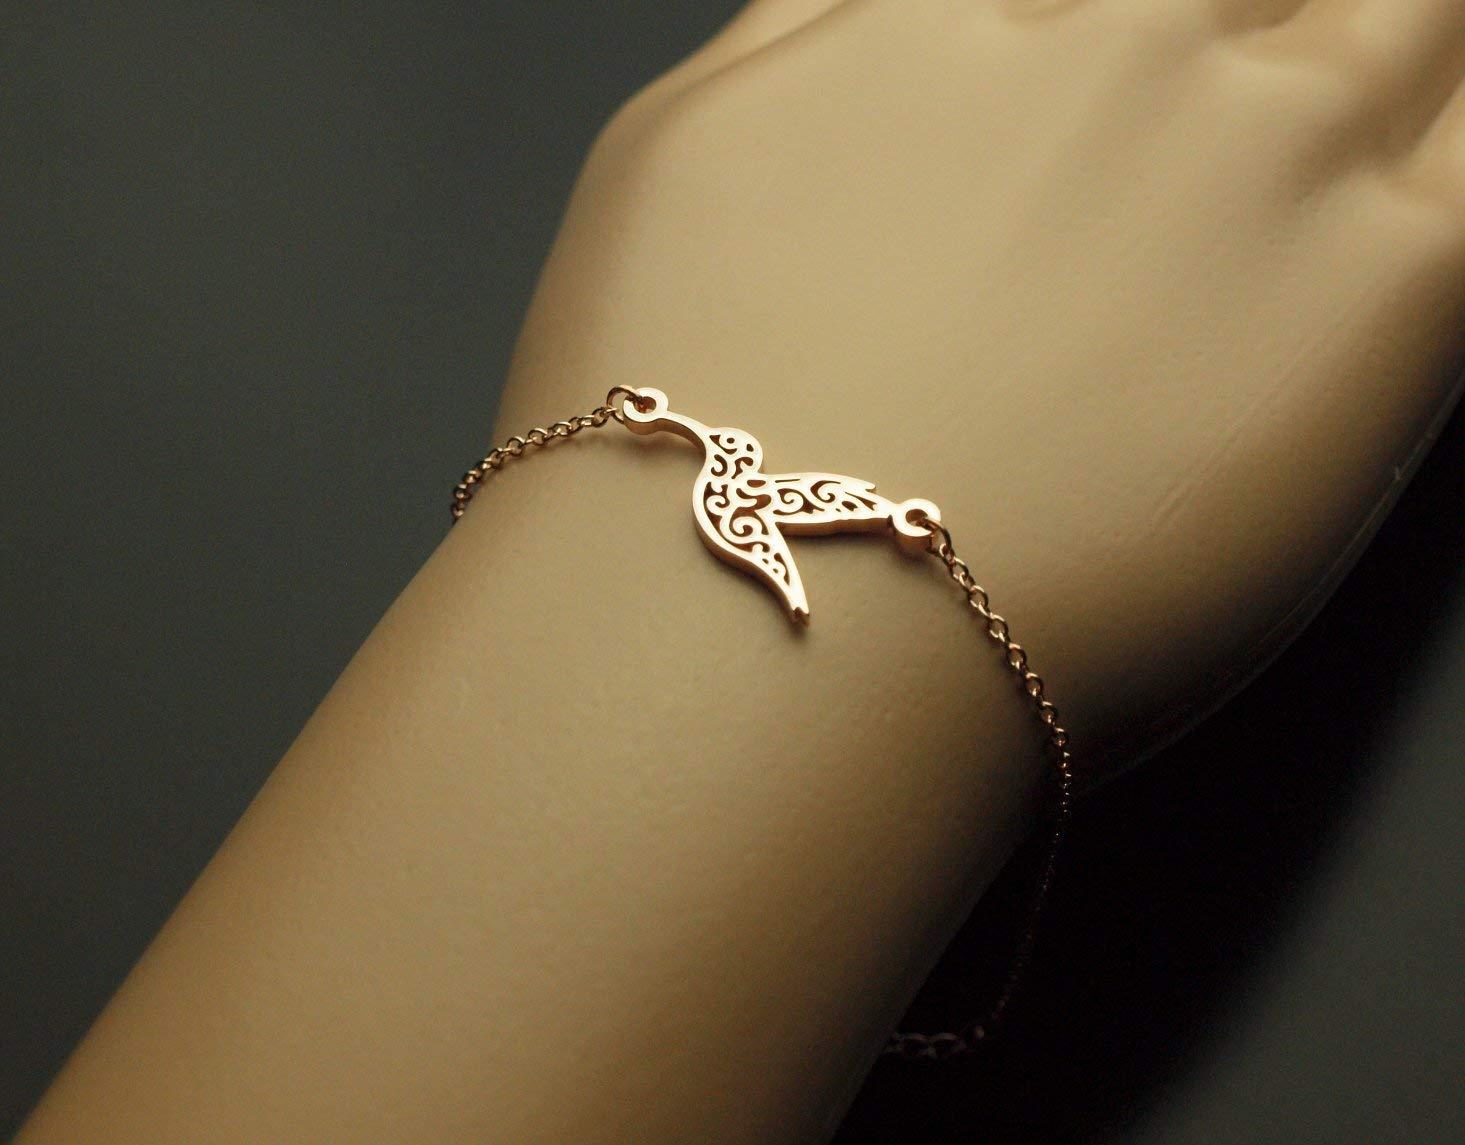 Armreifen Mond mit Stern Armband Armkette bronze Juvelato